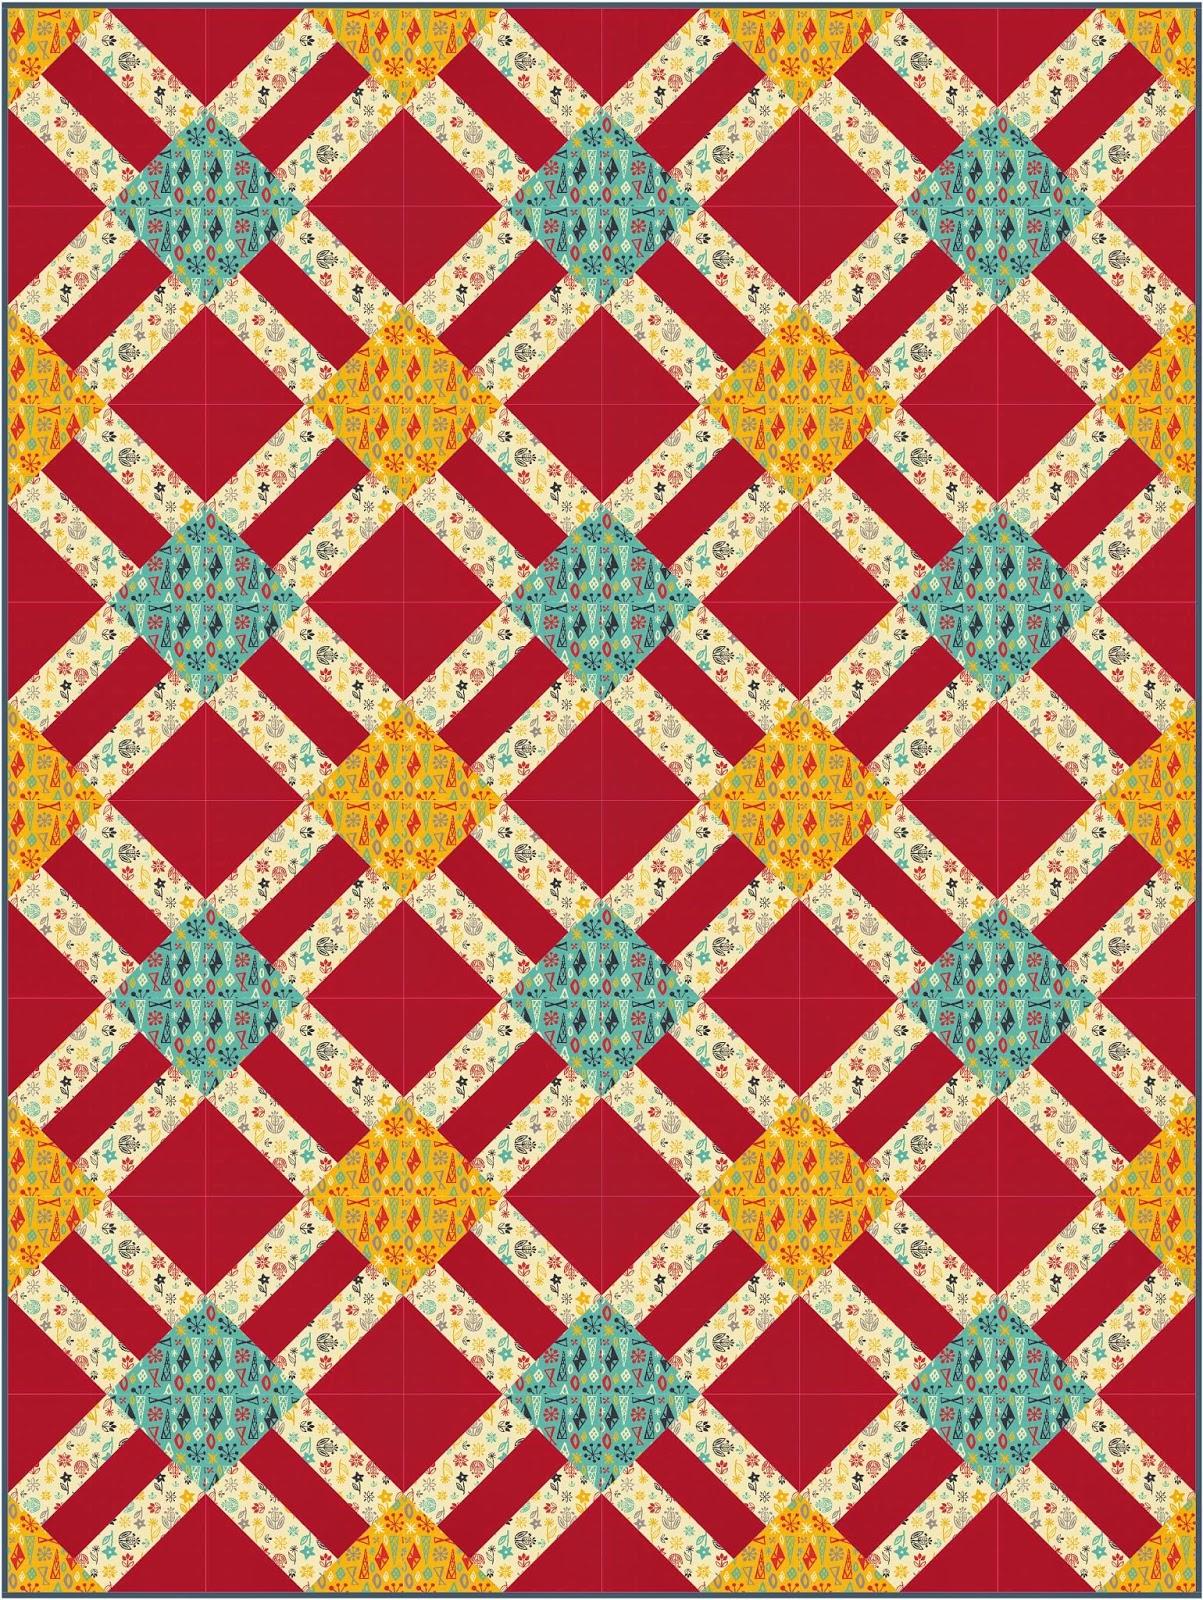 Meadow Mist Designs Cracker Lattice A Free Quilt Pattern From